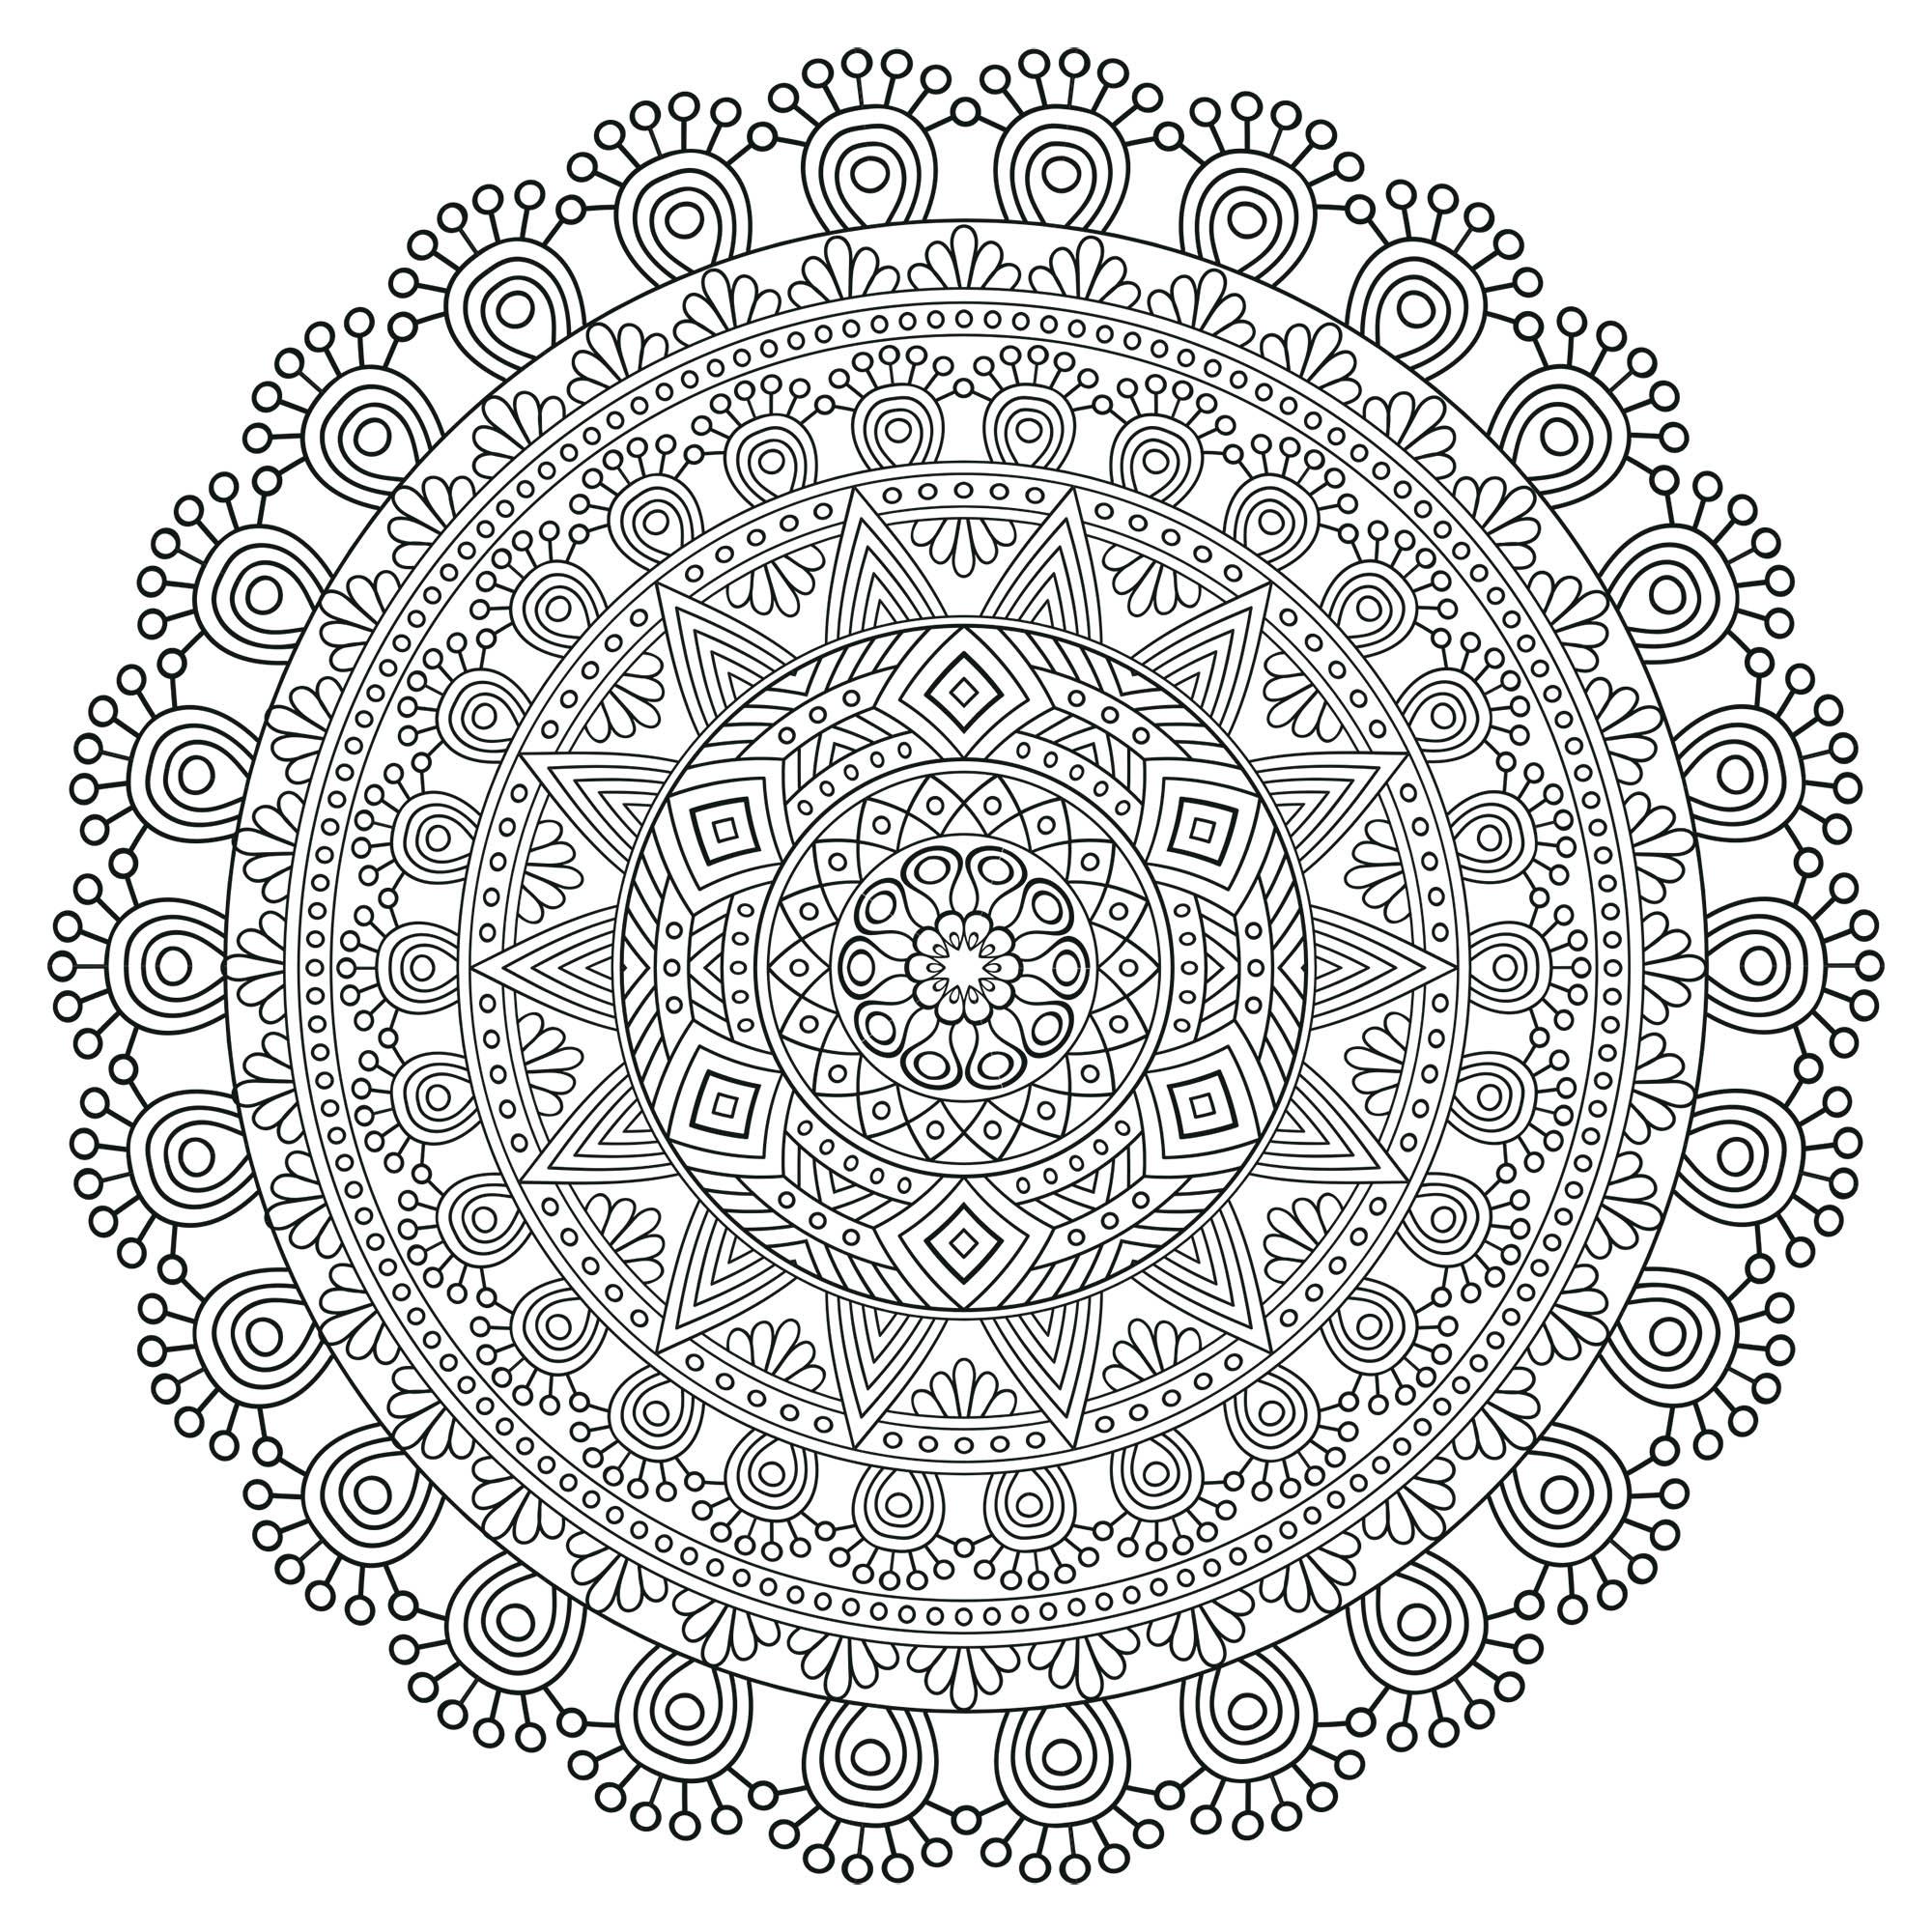 Mandala zen antistress 5 mandalas coloriages difficiles pour adultes - Dessin anti stress mandala ...